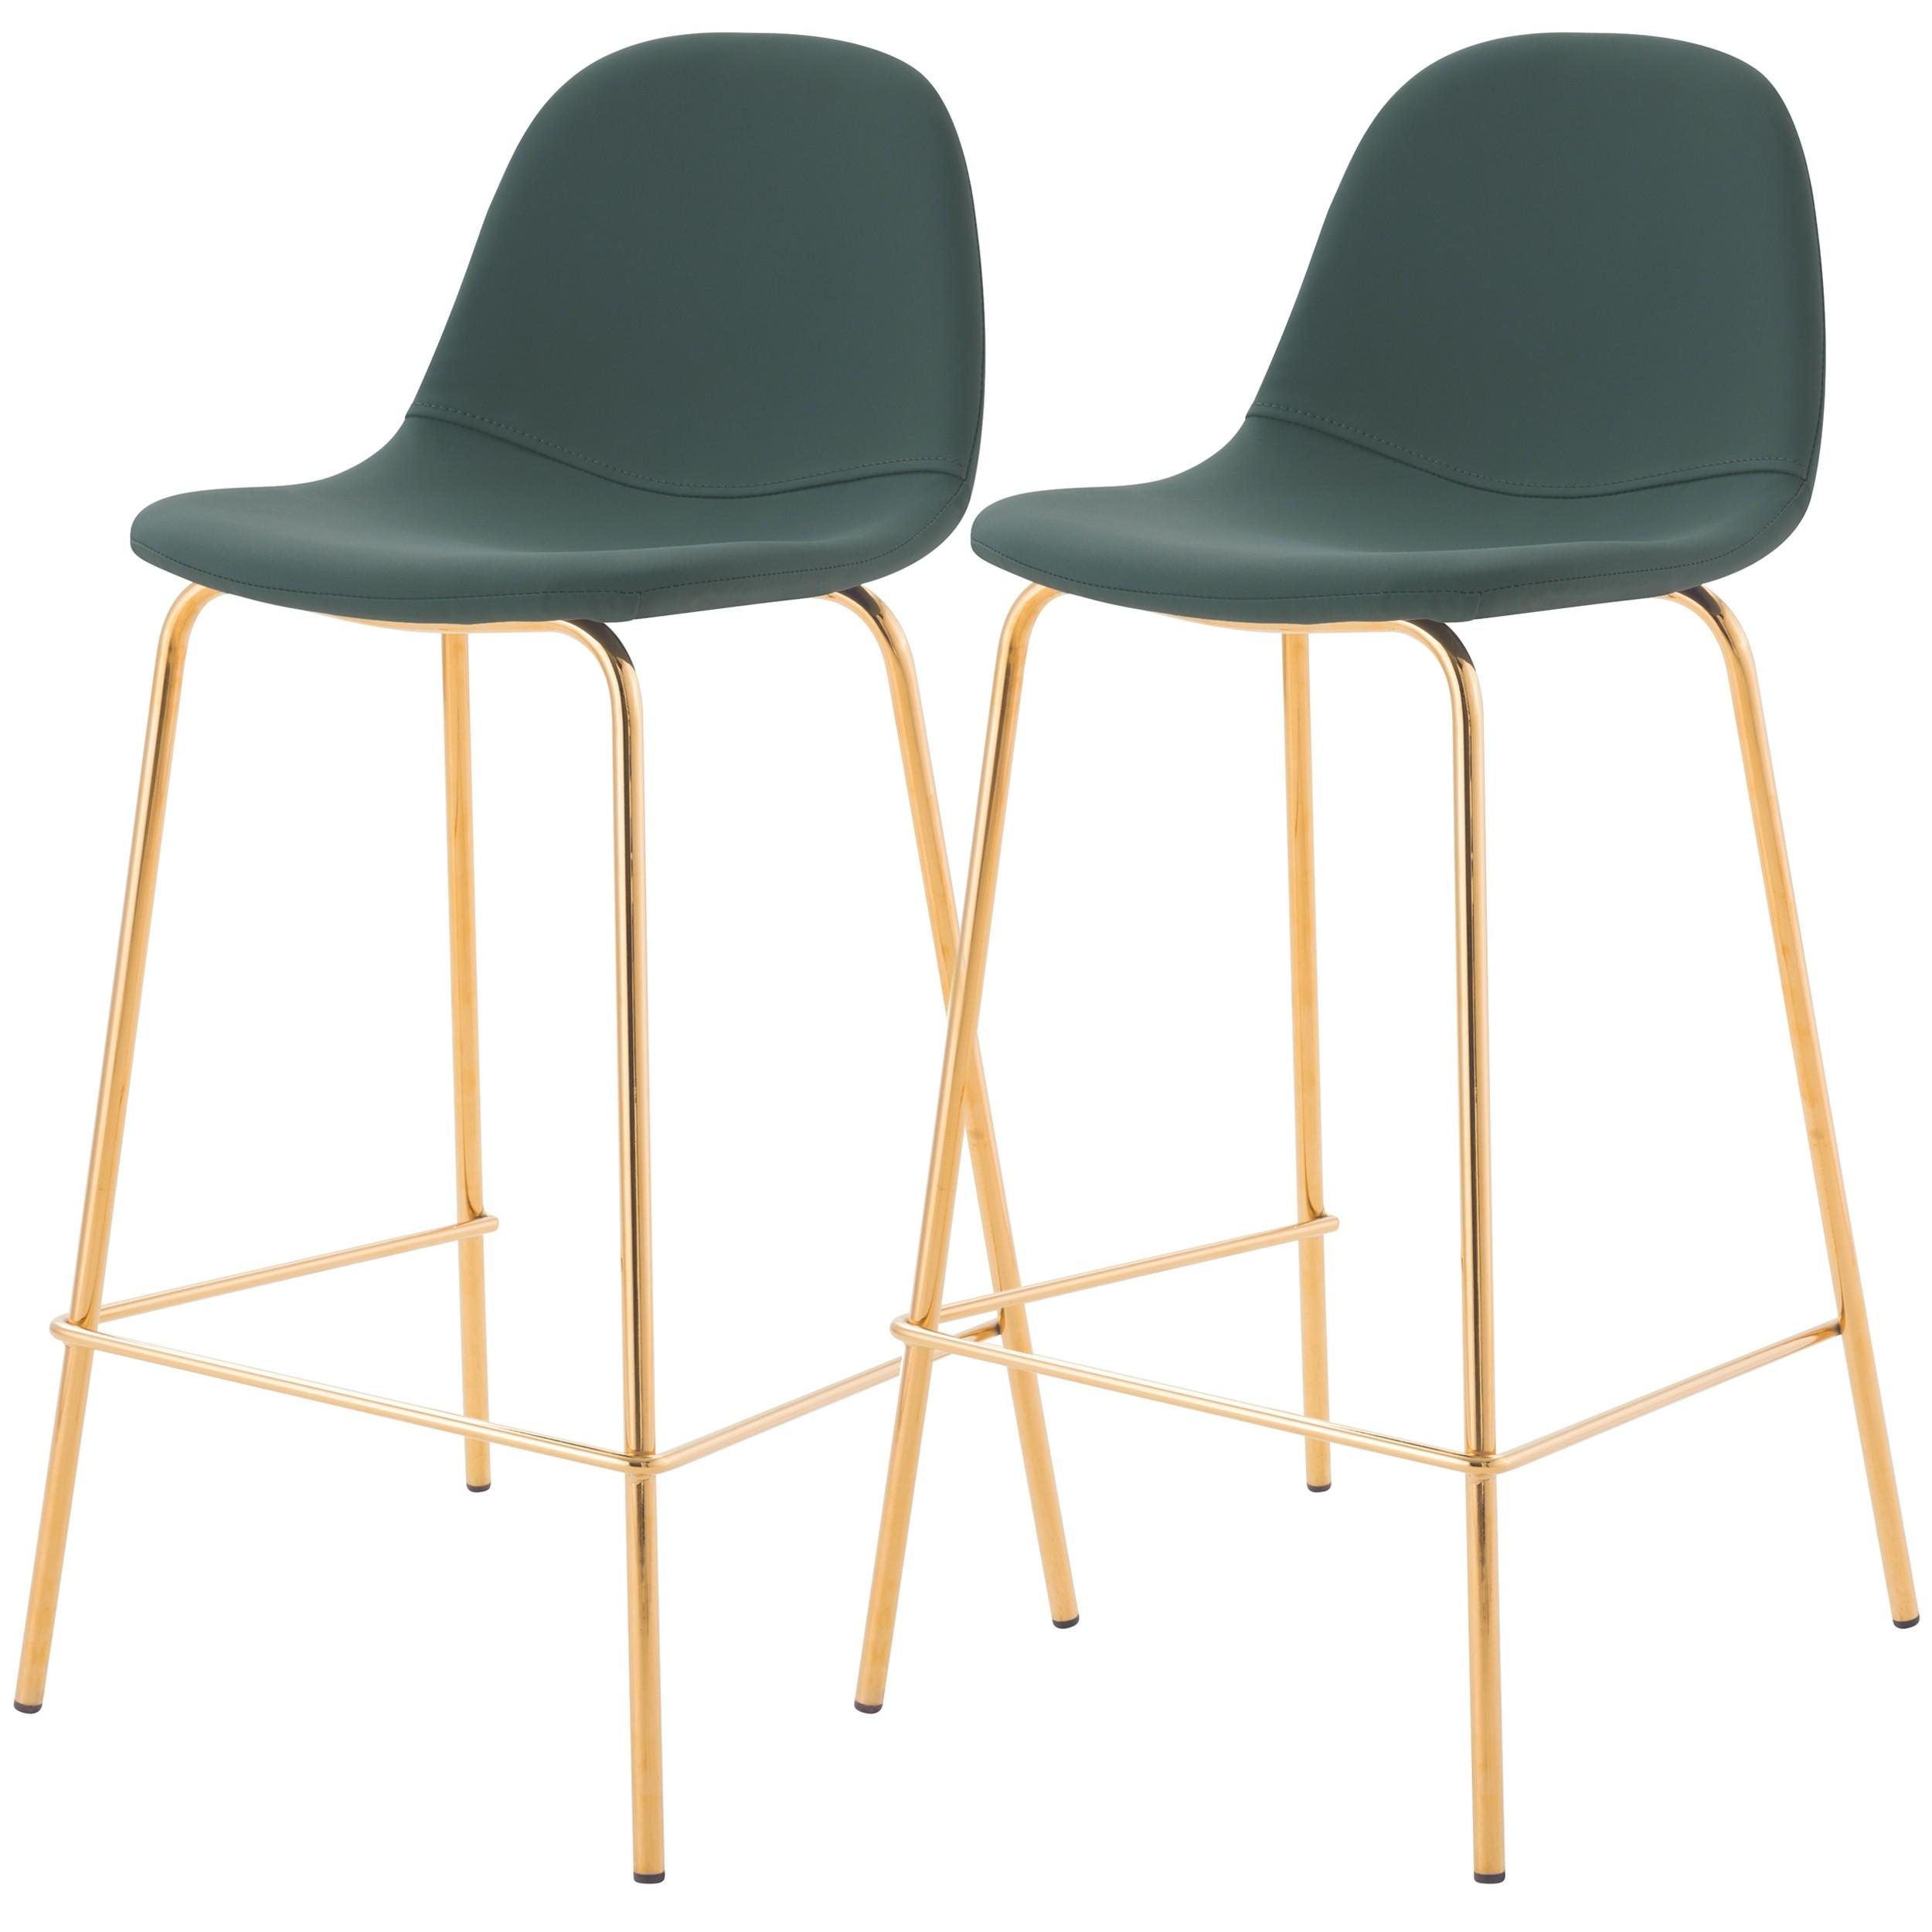 acheter chaise de bar en cuir synthetique verte